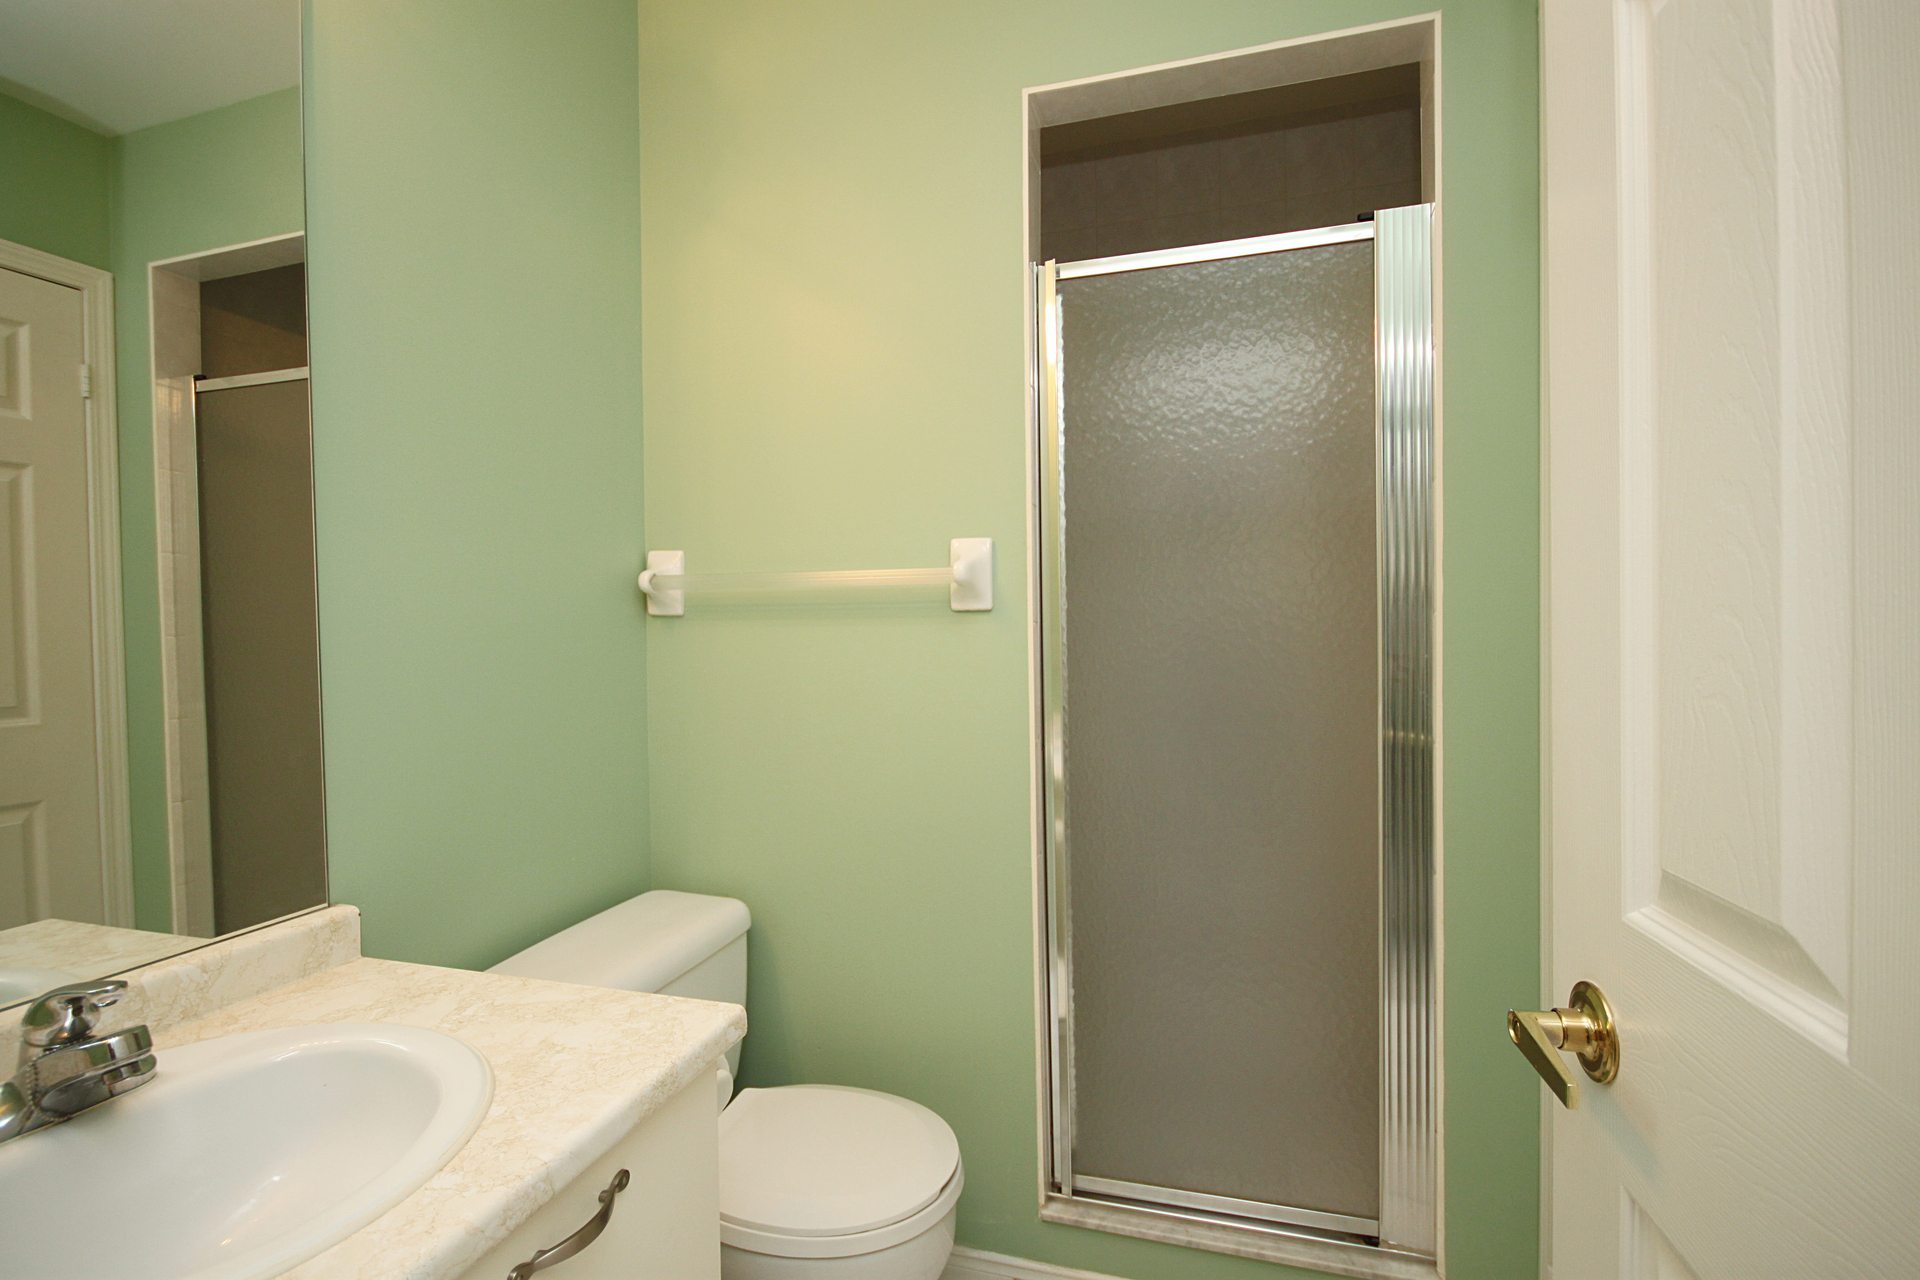 3 Piece Ensuite Bathroom at 310 - 600 Eglinton Avenue E, Mount Pleasant East, Toronto